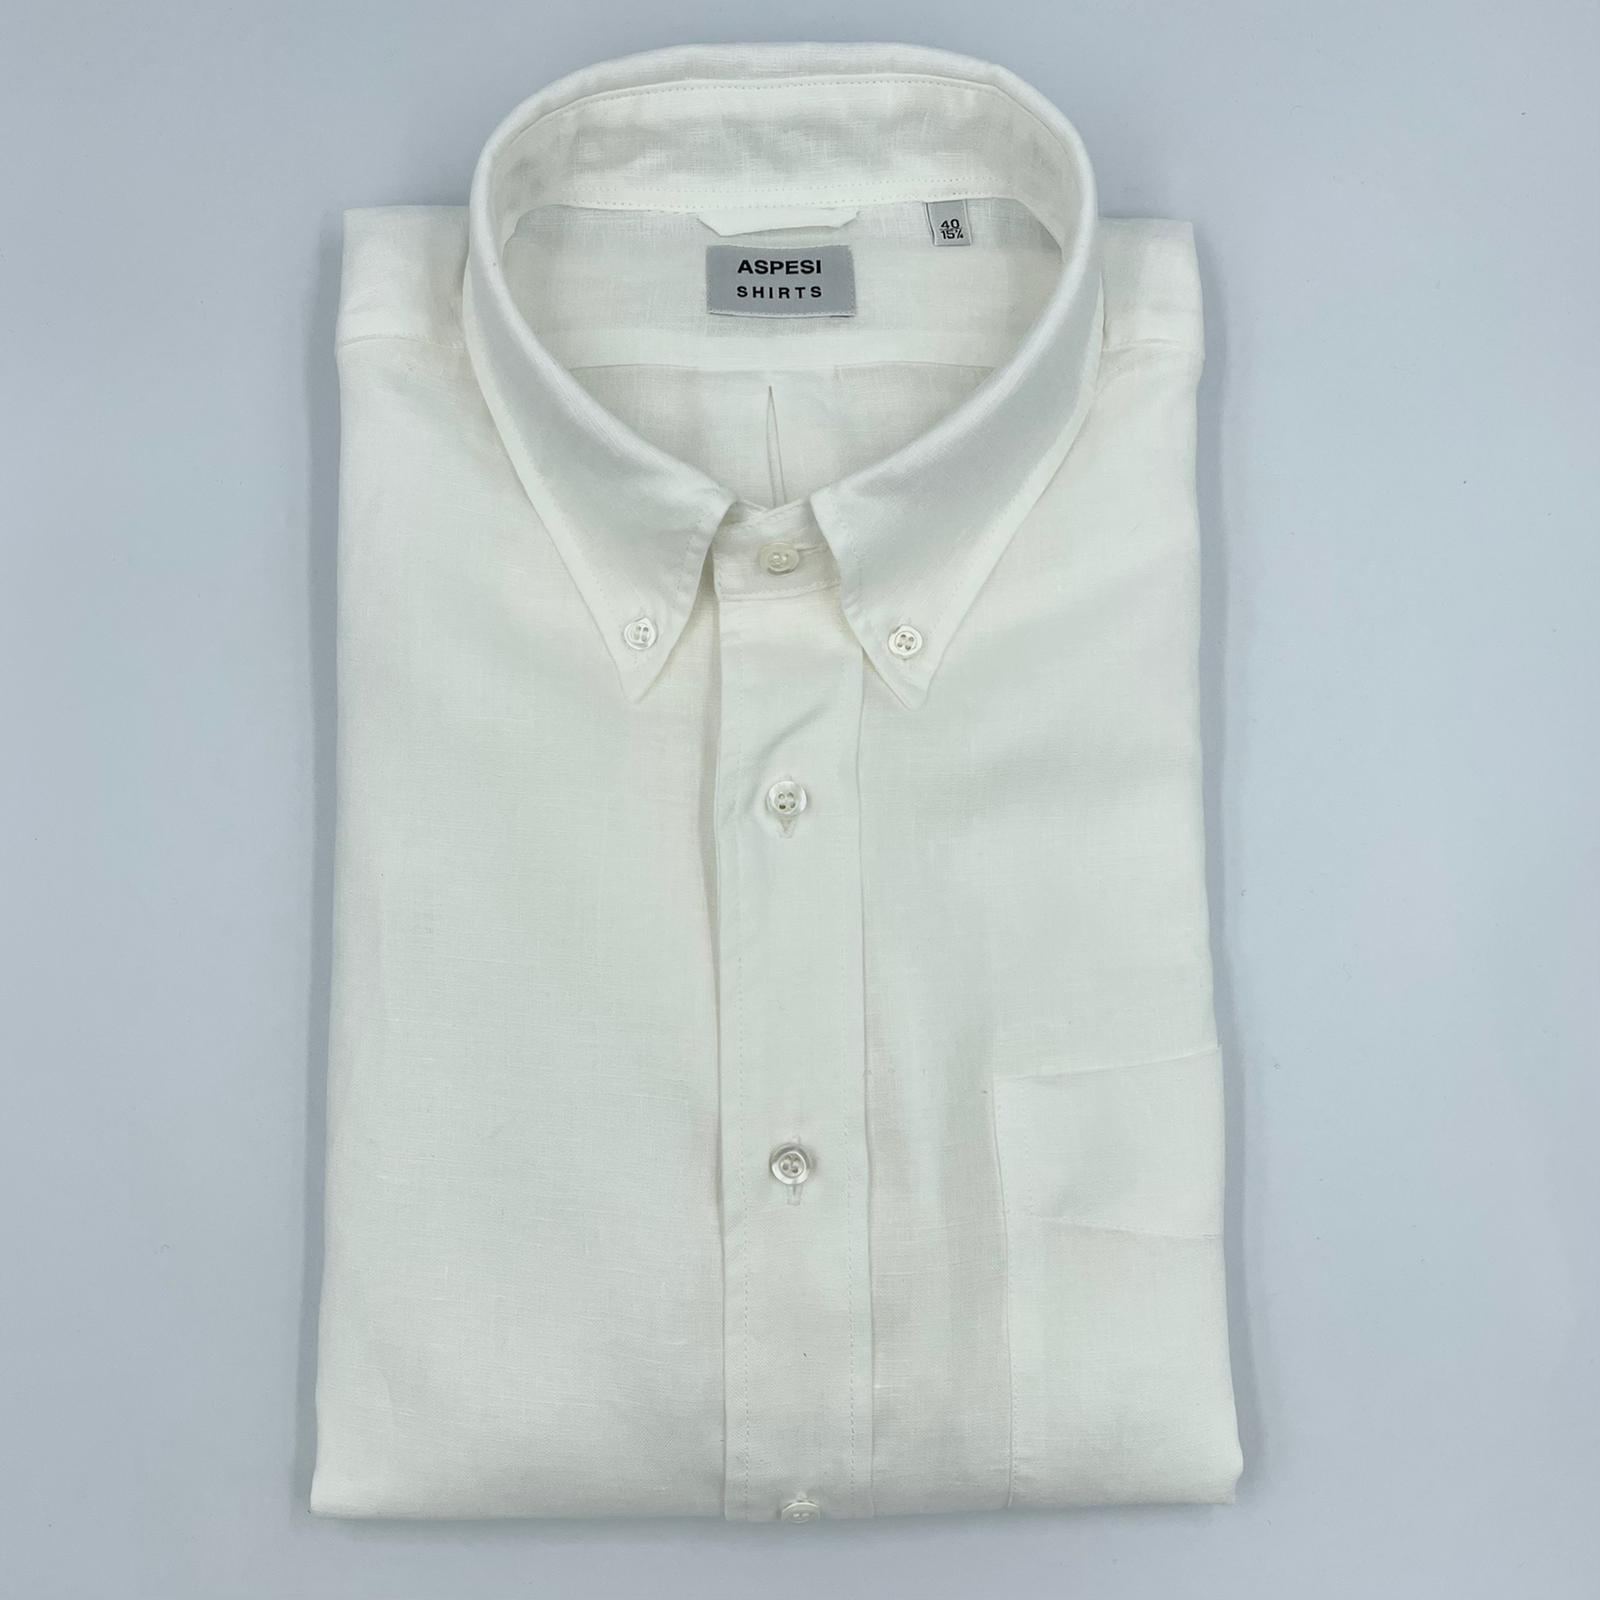 ASPESI Linnen Shirt B.D.Magra White